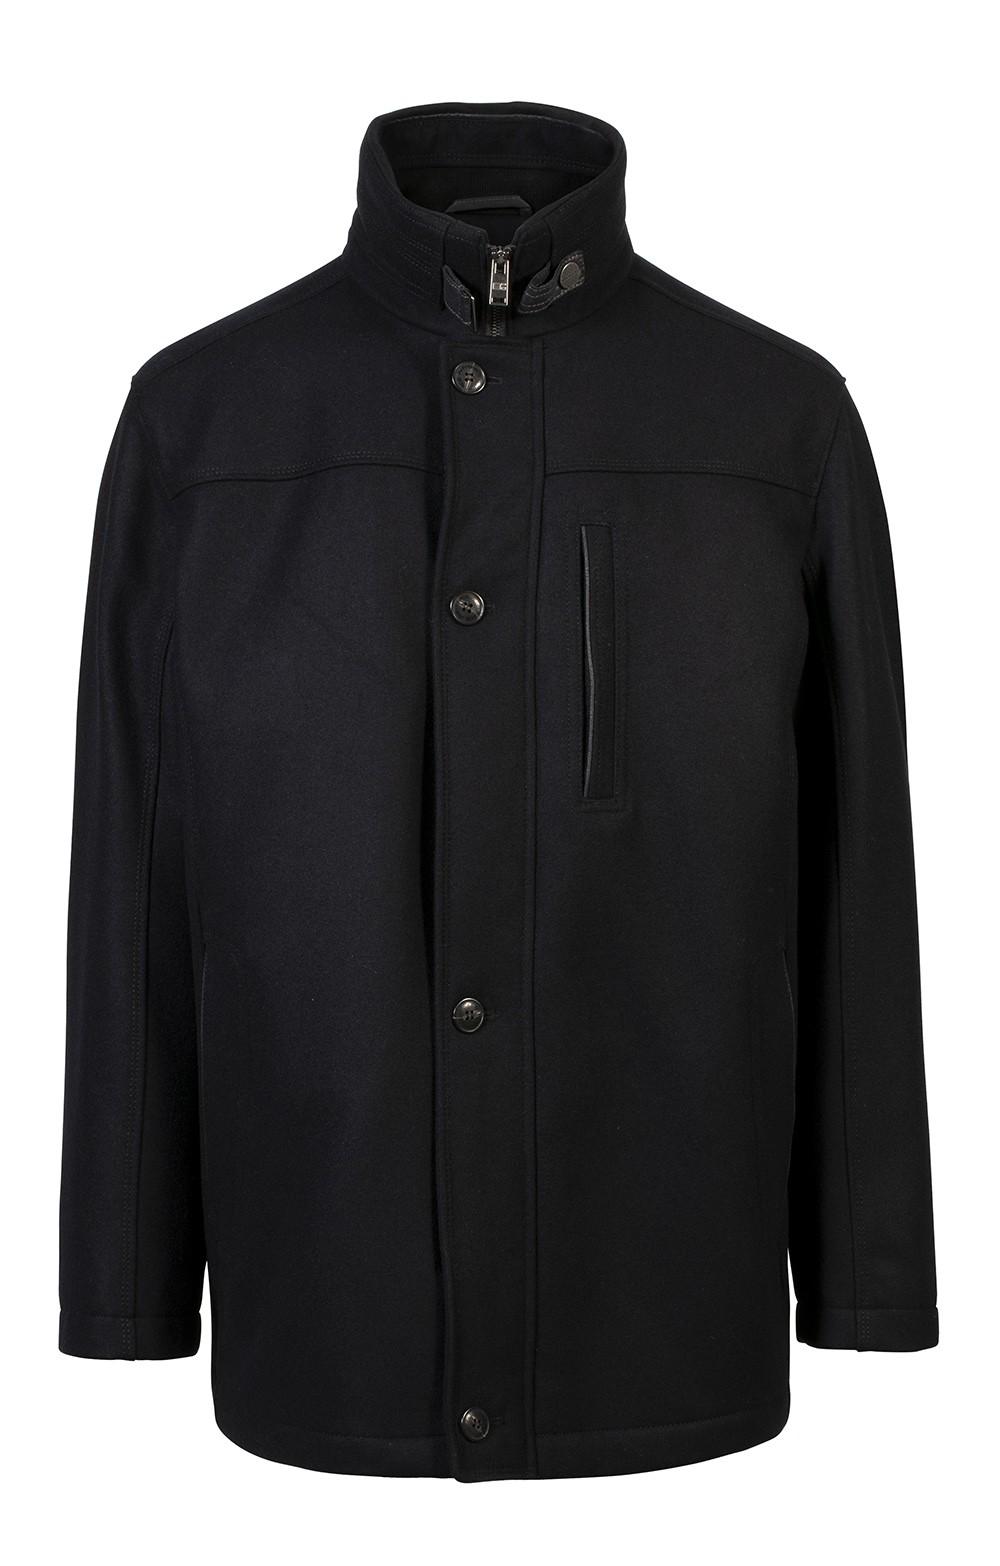 6d30c4b0d400 Mens Classic Wool Coat - House of Bruar